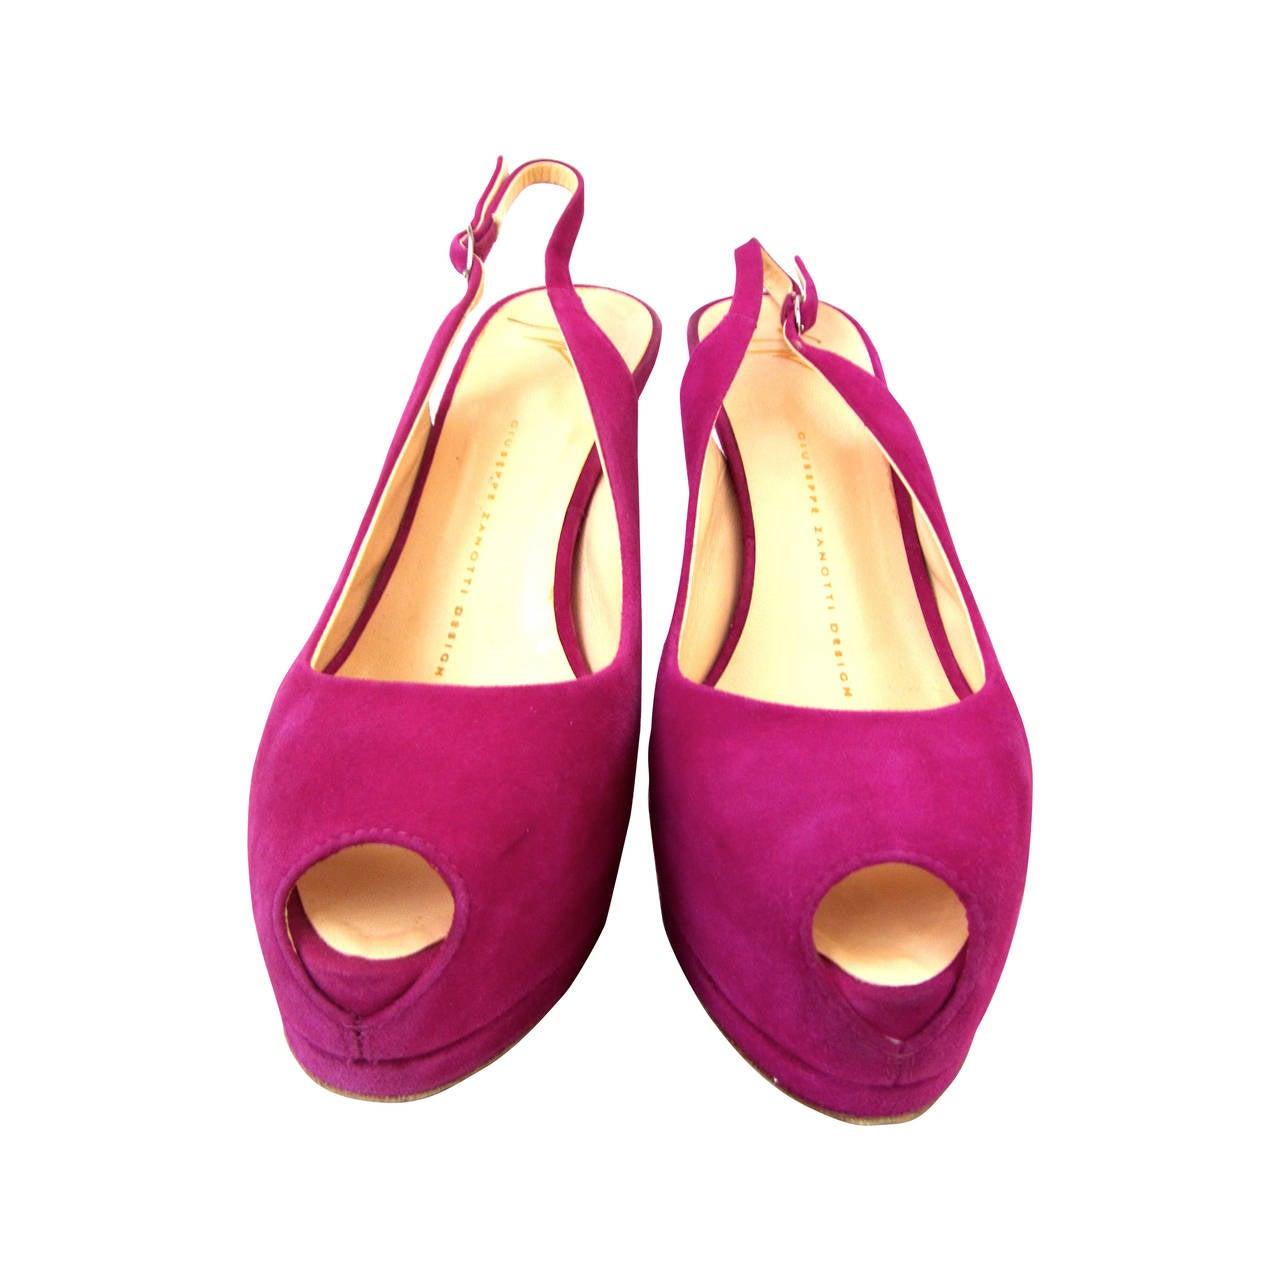 Giuseppe Zanotti Pink Fuchsia Suede Pumps with Heel Strap - Size 37